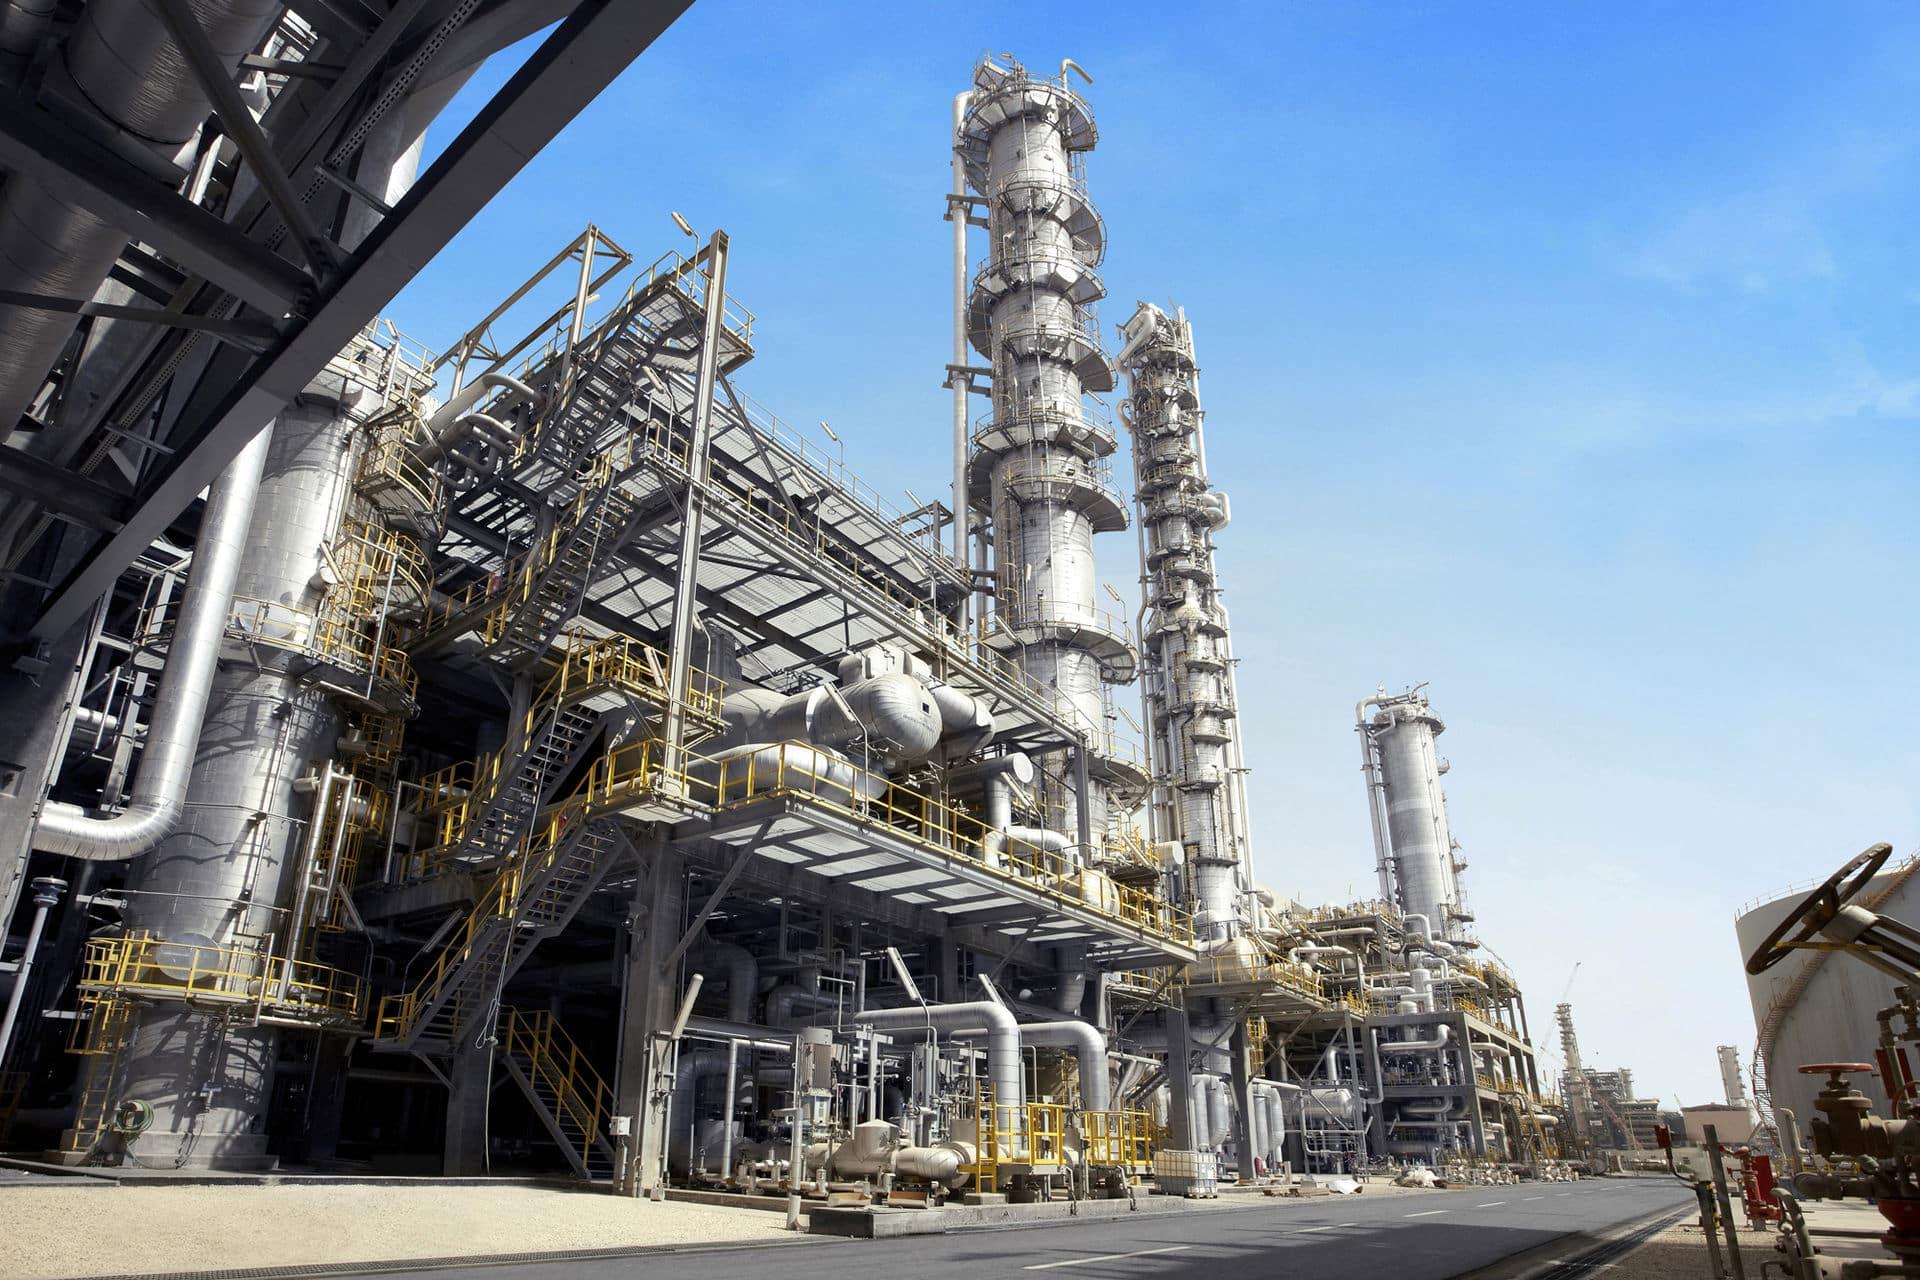 Petrochemical plant (Source: Wikipedia)